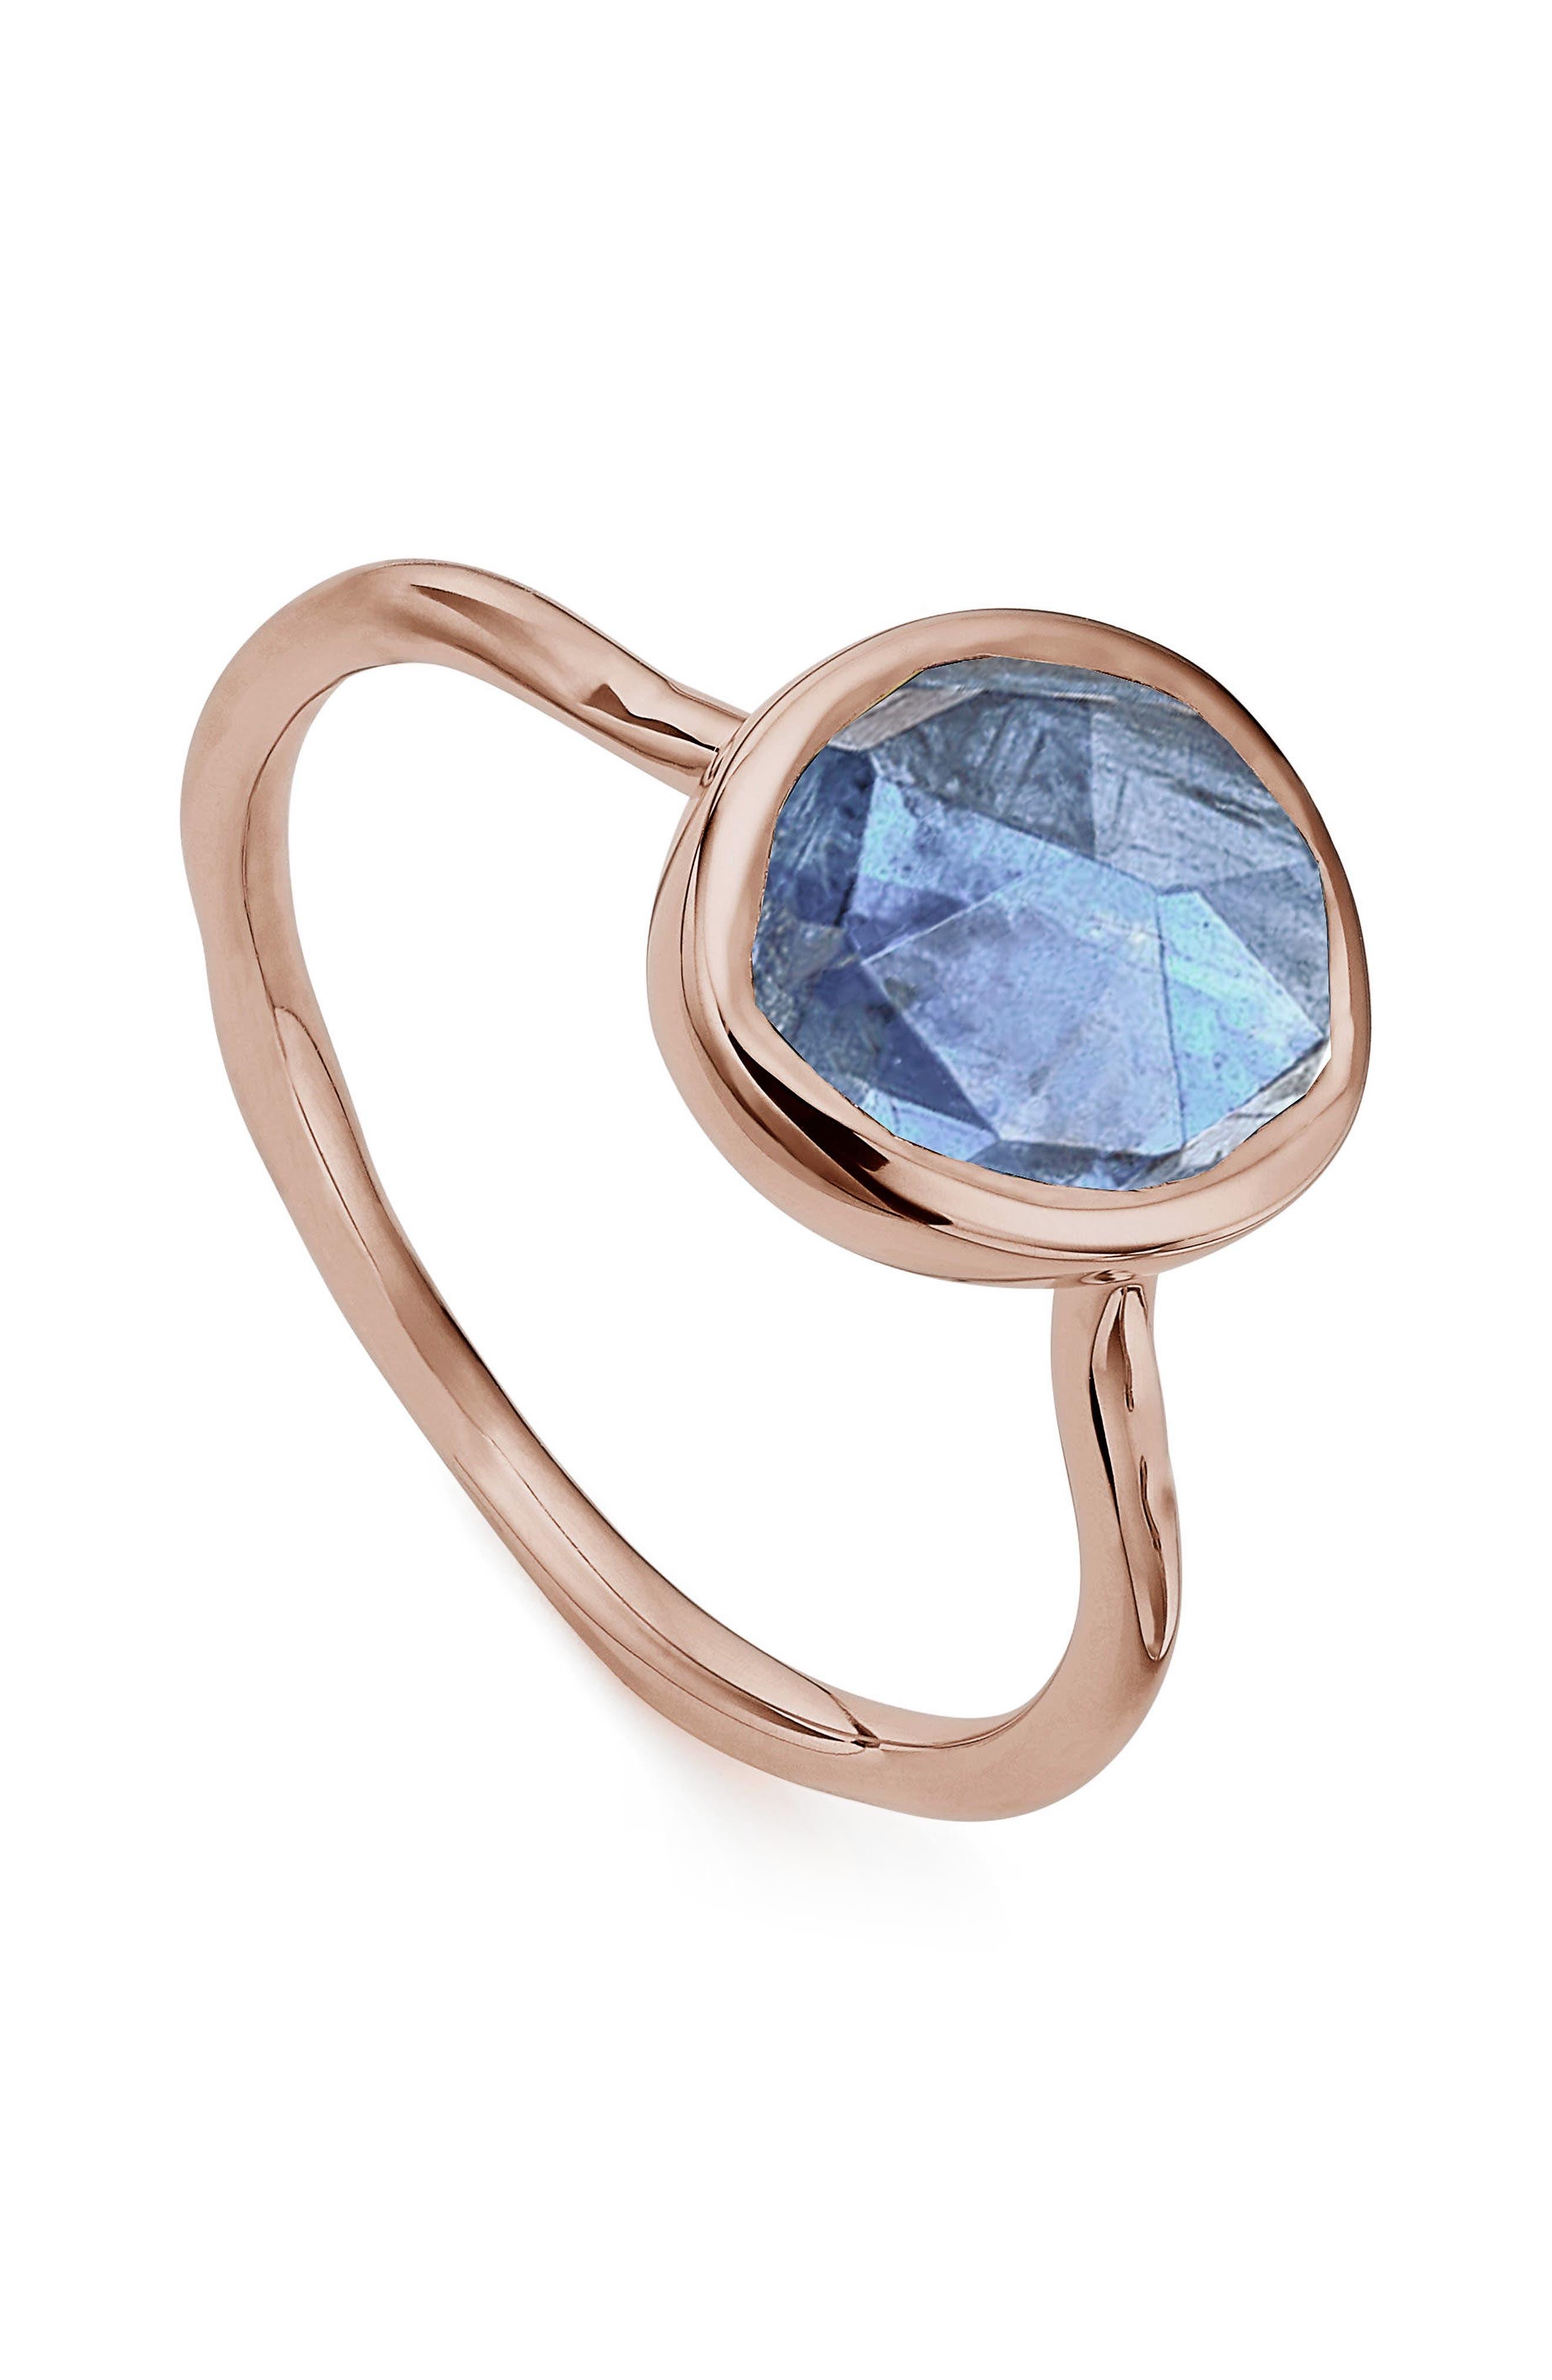 MONICA VINADER, Siren Semiprecious Stone Stacking Ring, Alternate thumbnail 3, color, ROSE GOLD/ KYANITE